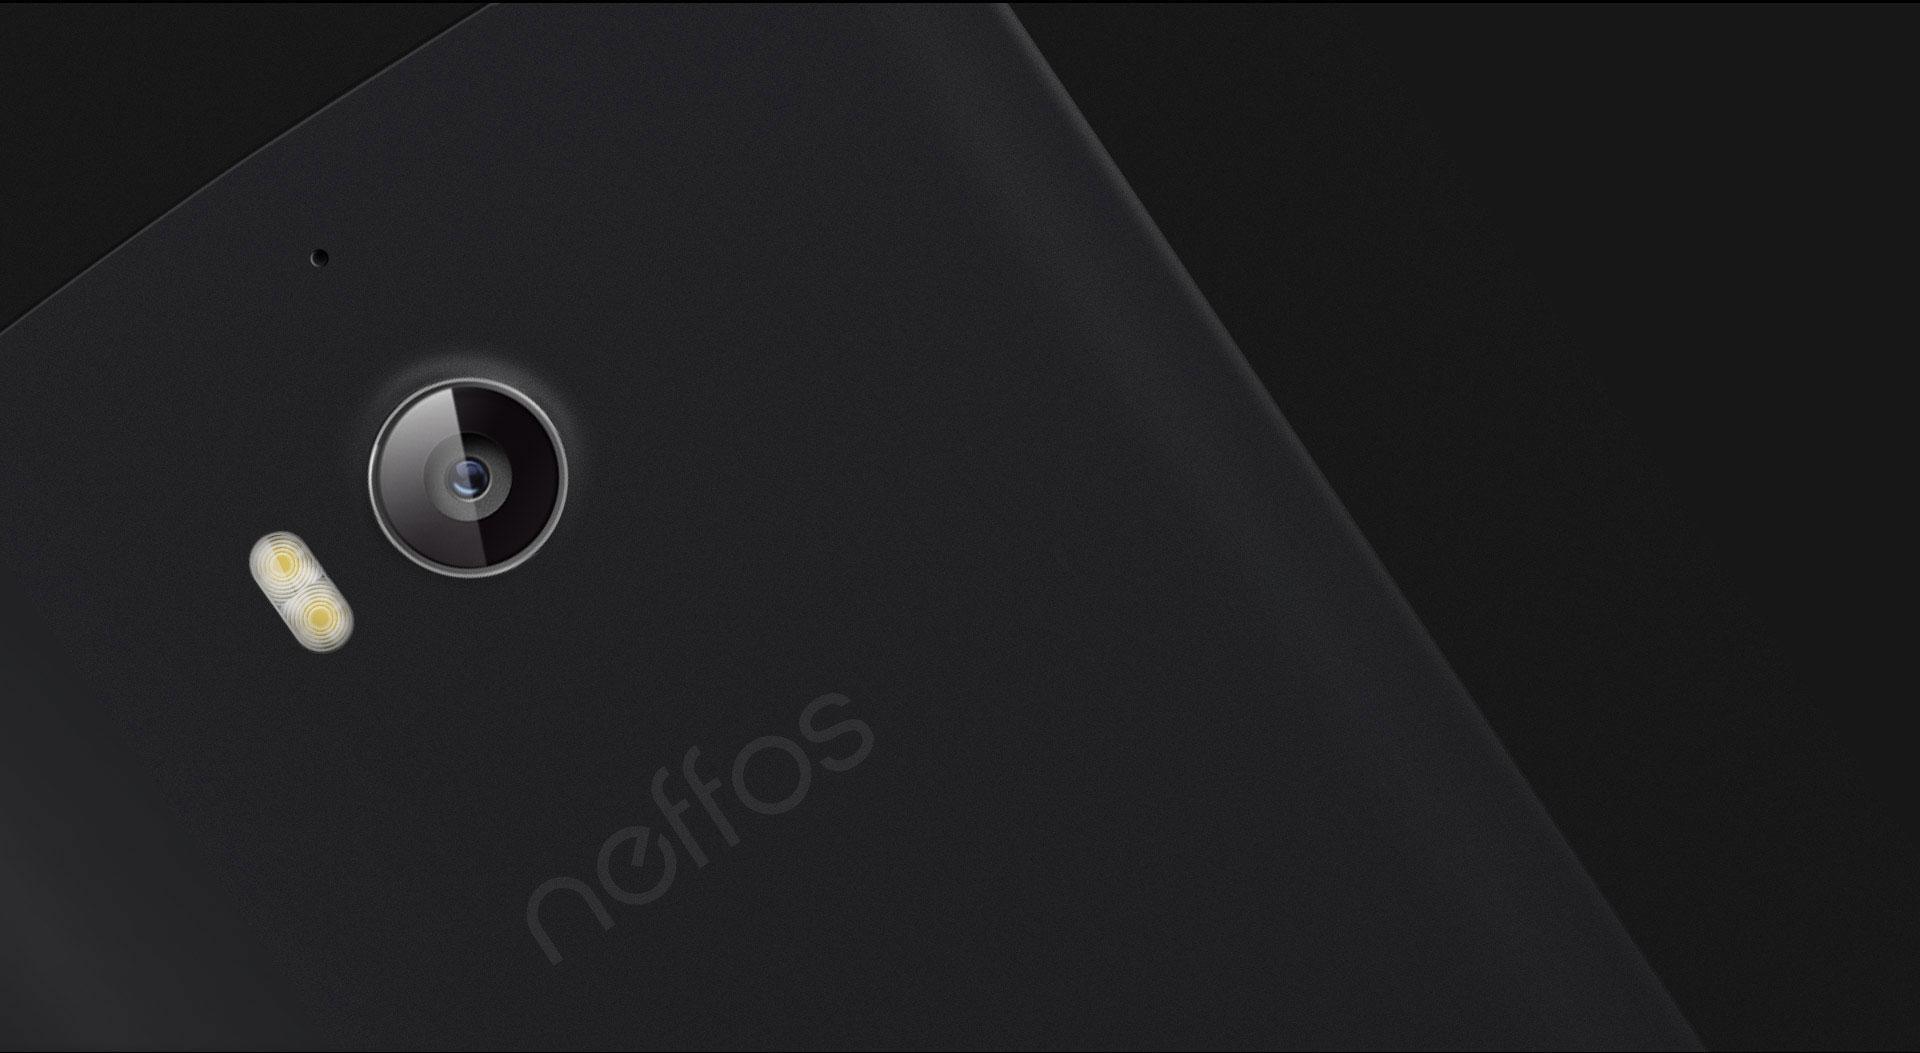 Neffos C5 Max detalle de la cámara